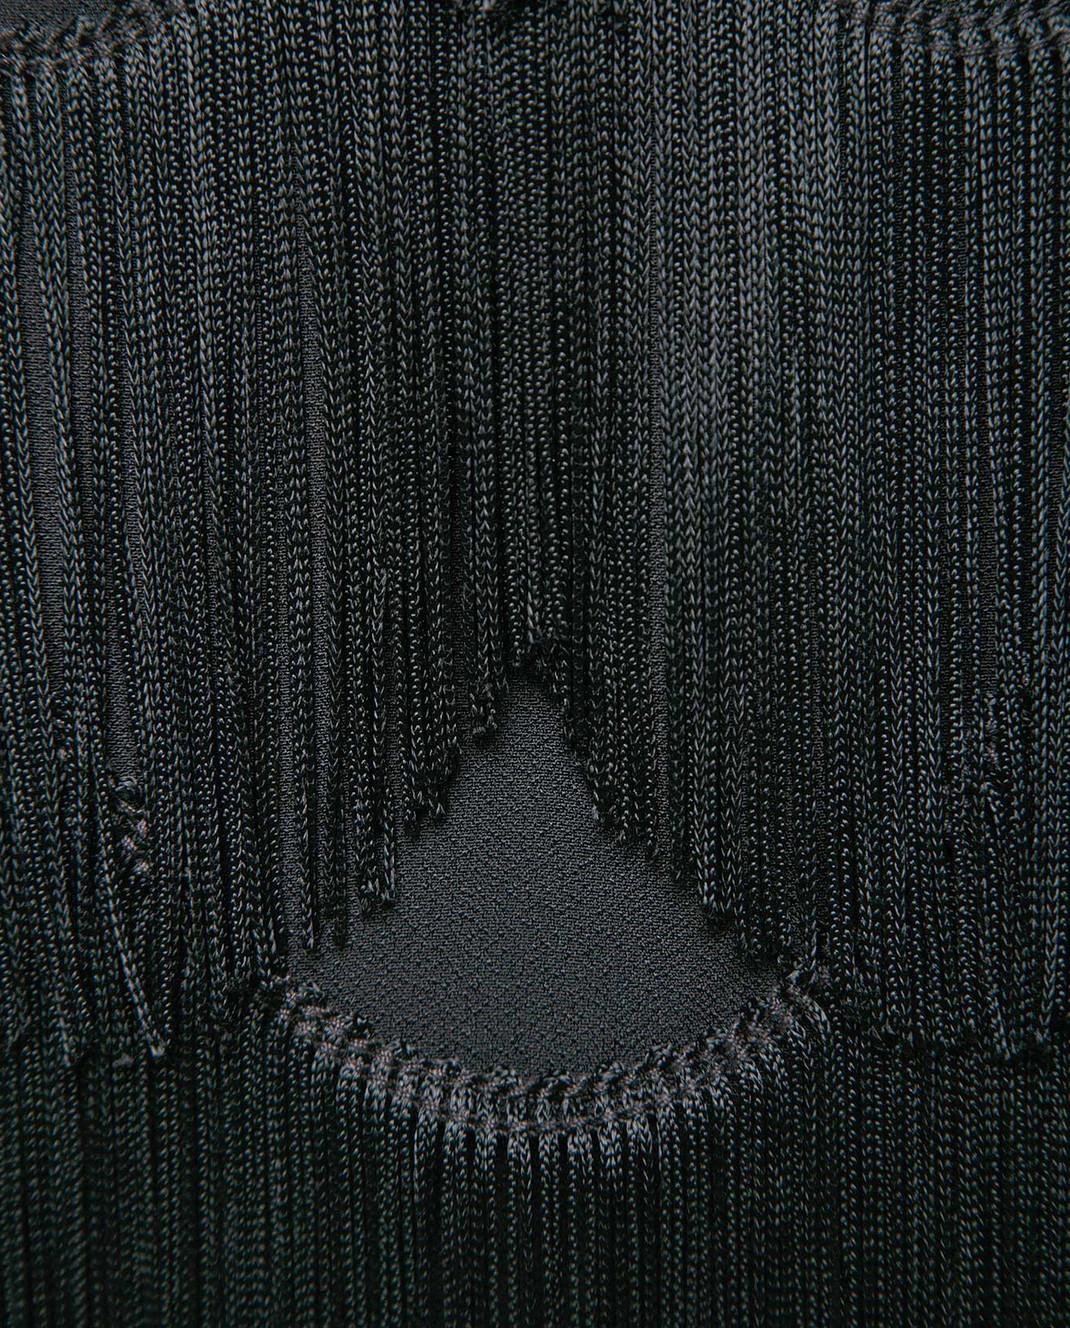 Marc Jacobs Черная юбка с бахромой M4007189 изображение 5